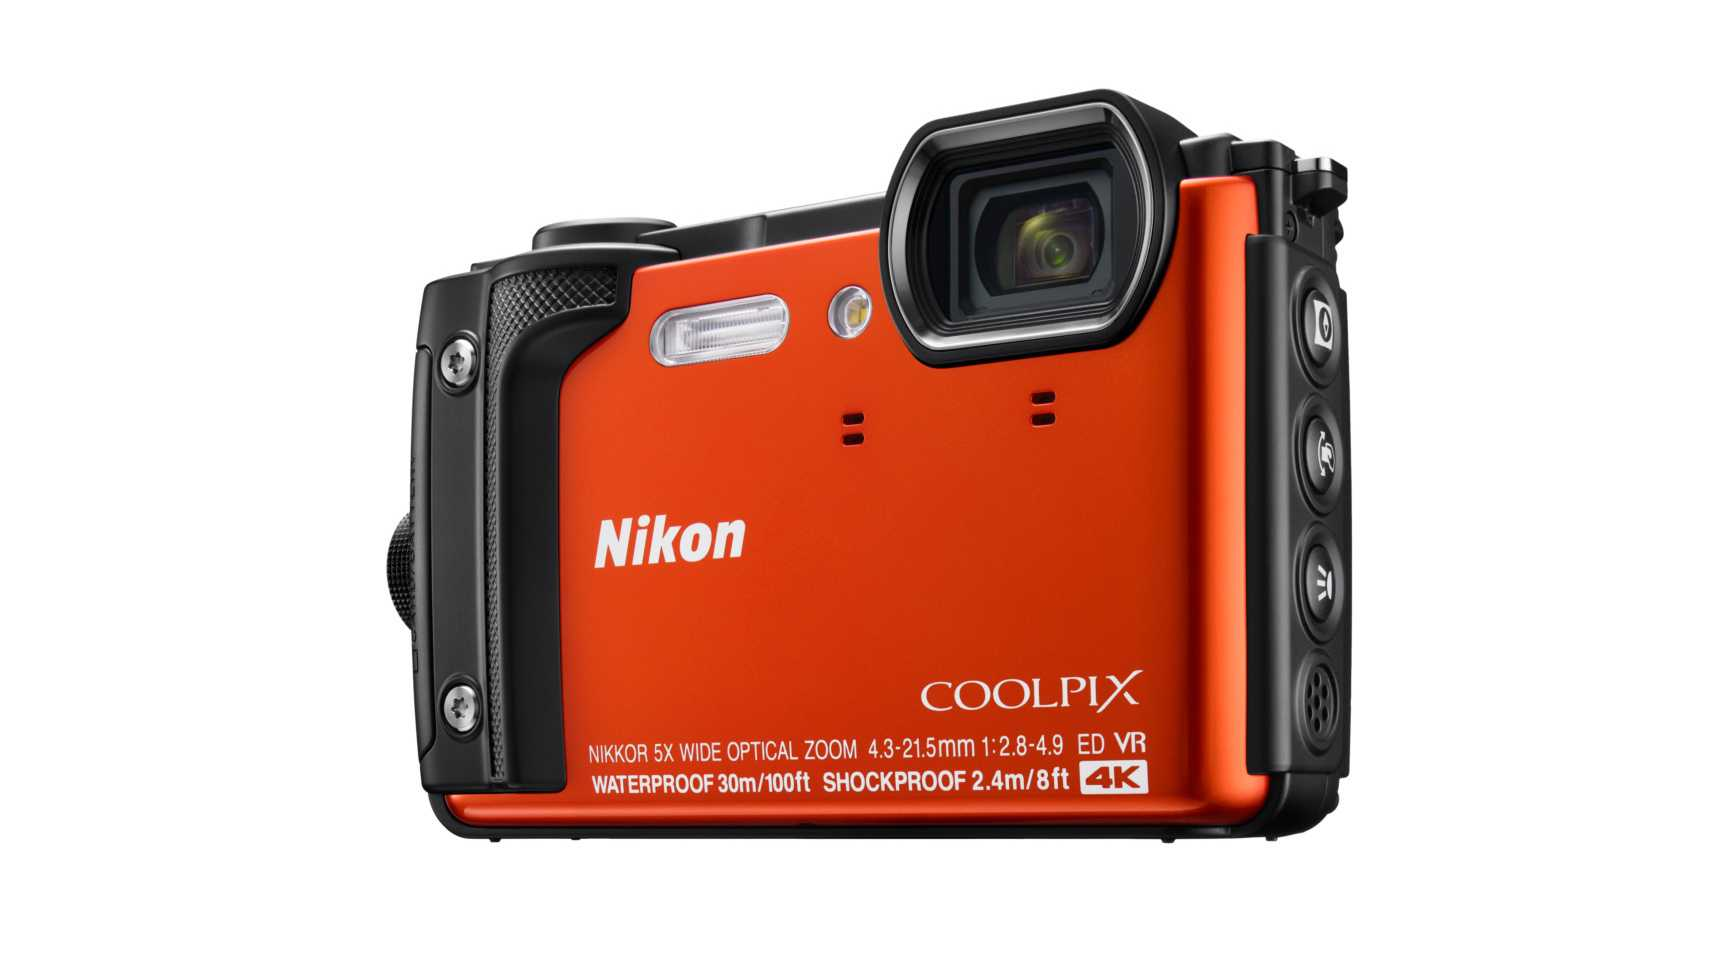 Wetterfeste Kompaktkamera Nikon Coolpix W300 vorgestellt